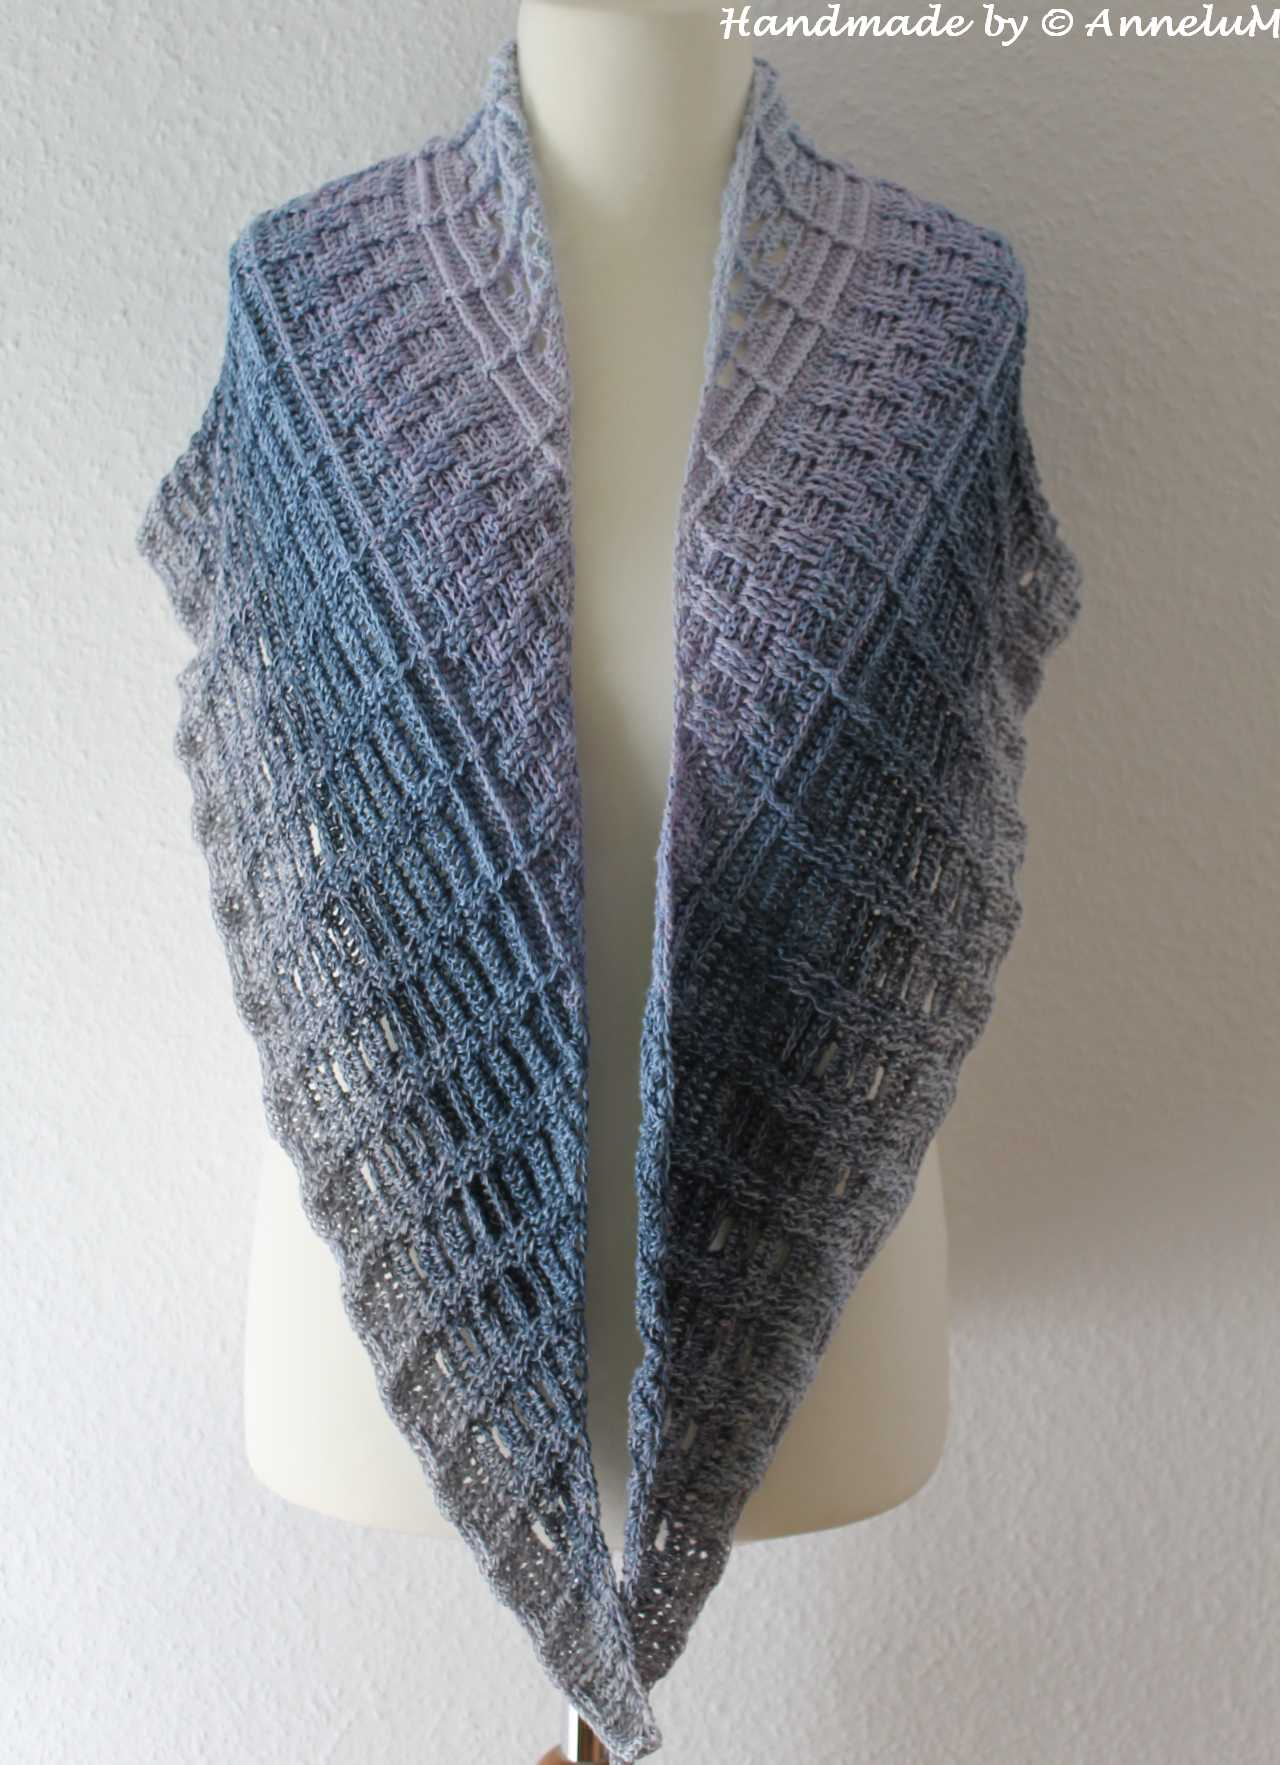 En hiver Handmade by AnneluM